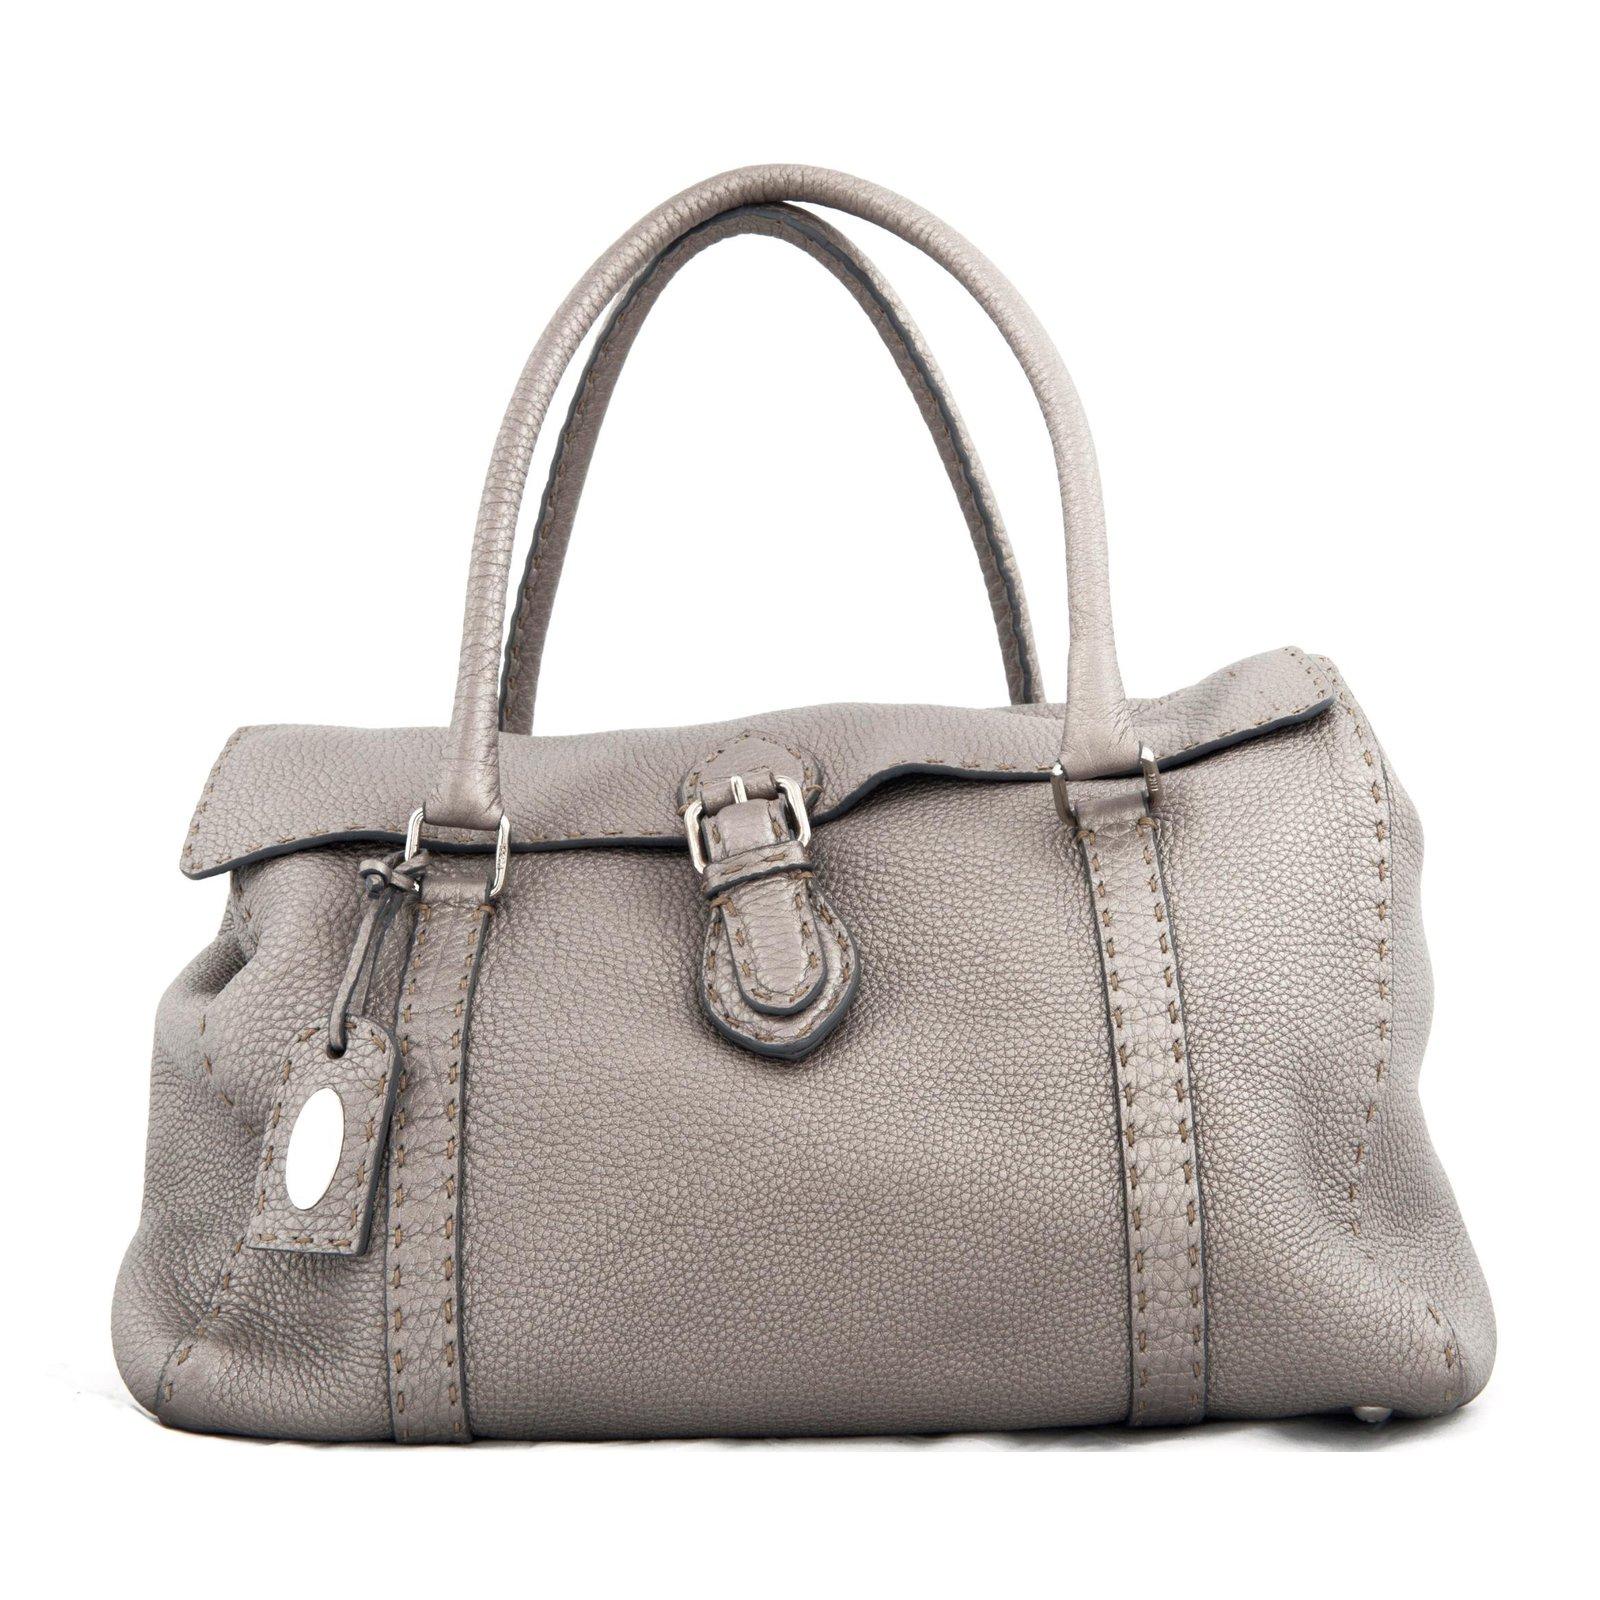 f4ae5c06e41e Fendi Grey leather   Selleria   shoulder bag Handbags Leather Grey ...